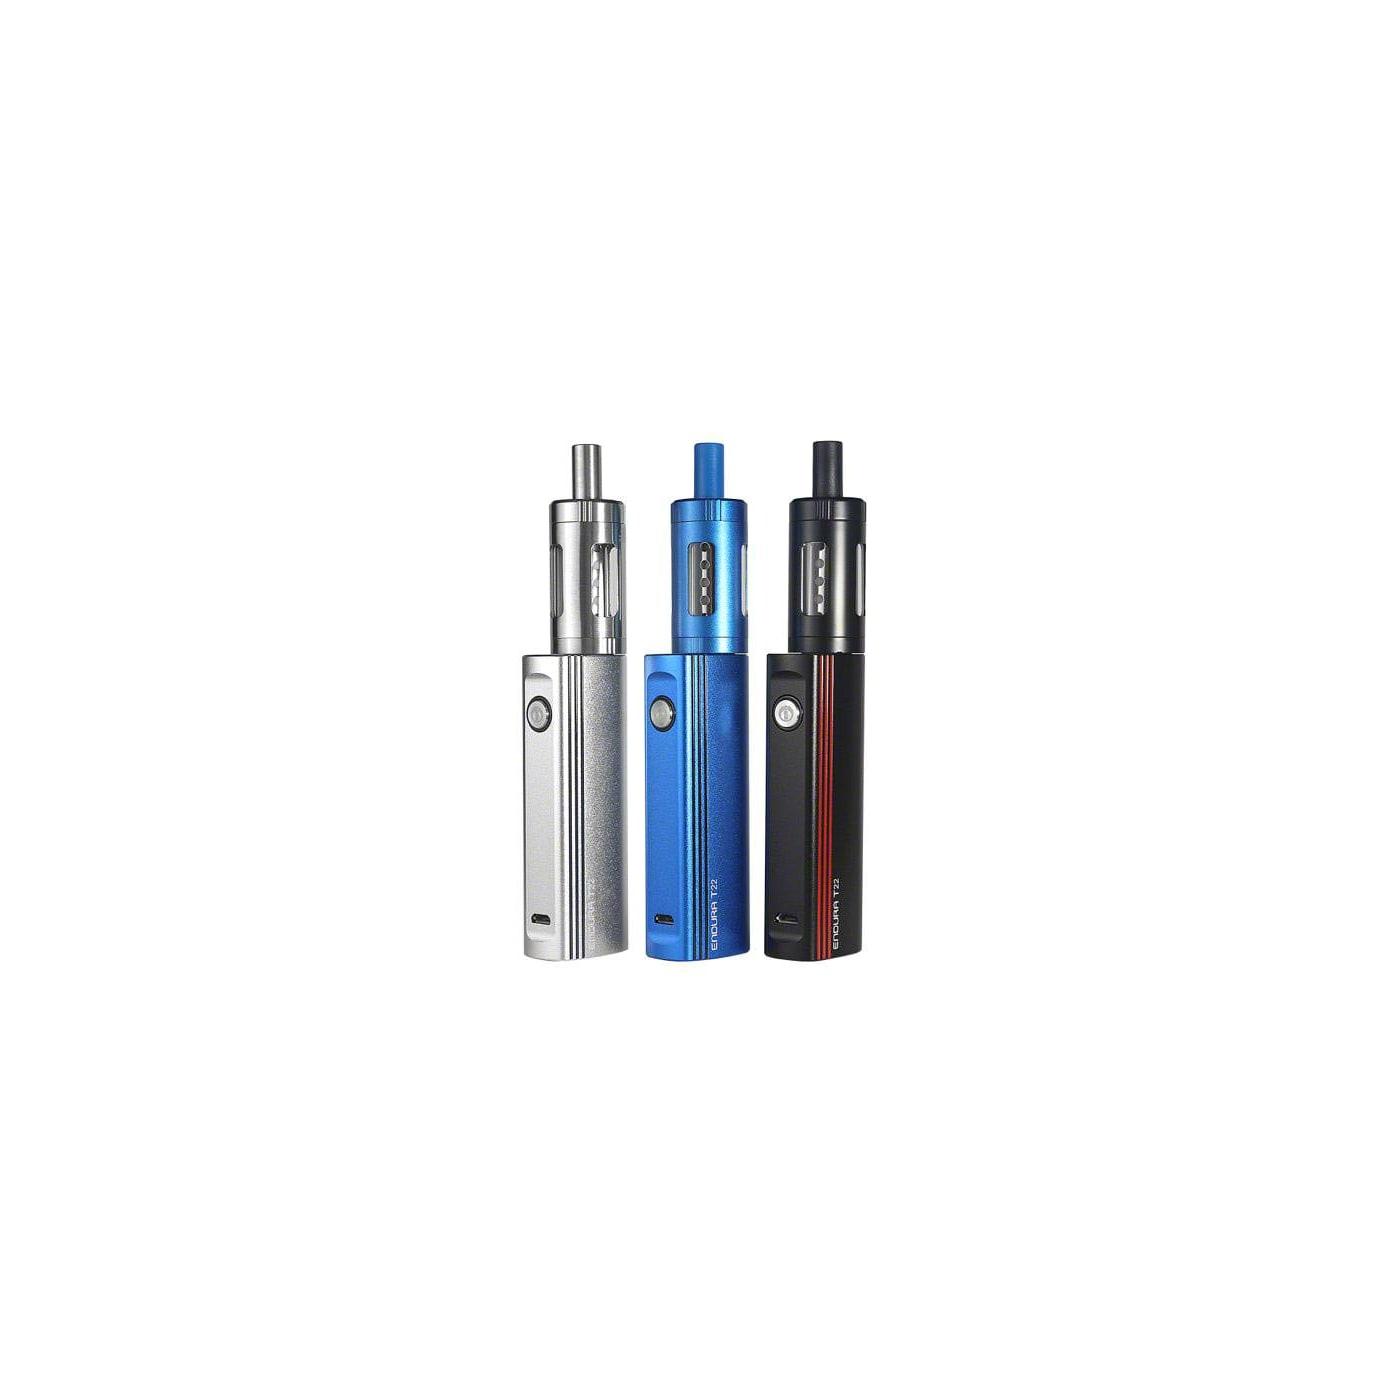 Innokin Endura T22 Starter Kit - Wholesale T18 Coils